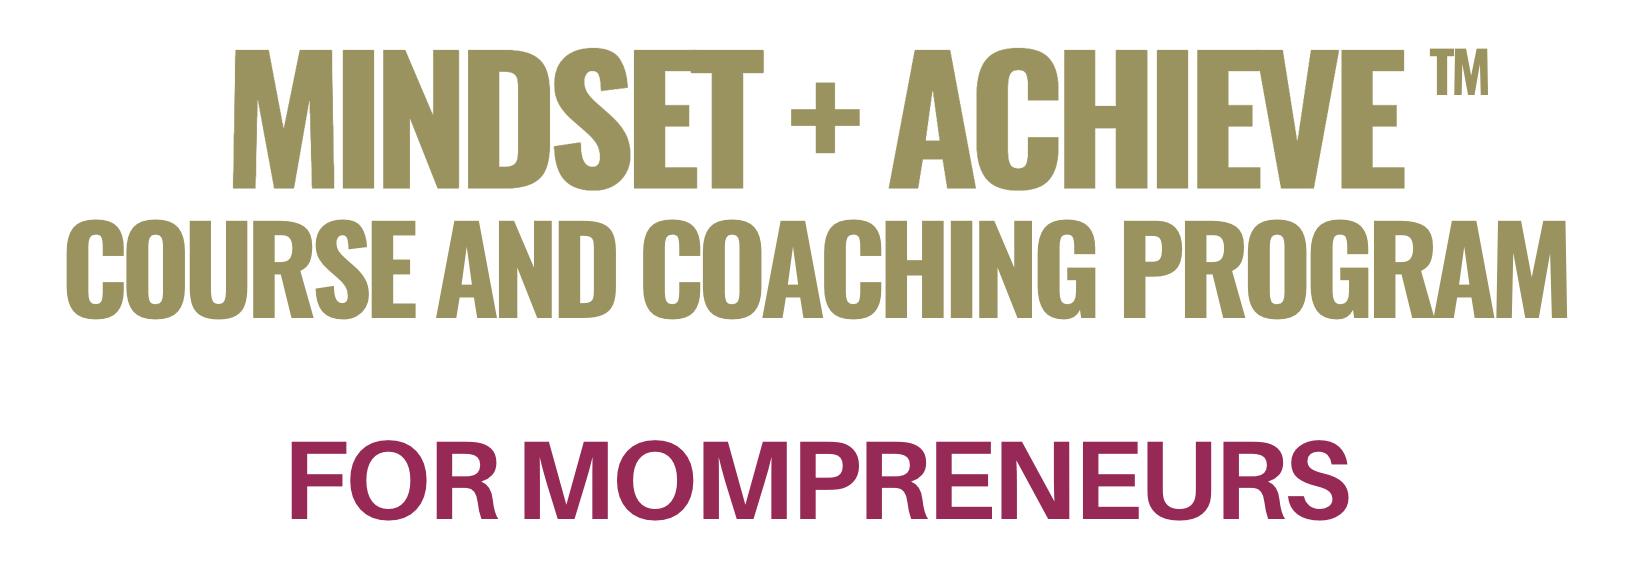 Mindset Coach and Achieve Expert Susan Vernicek for Mompreneurs